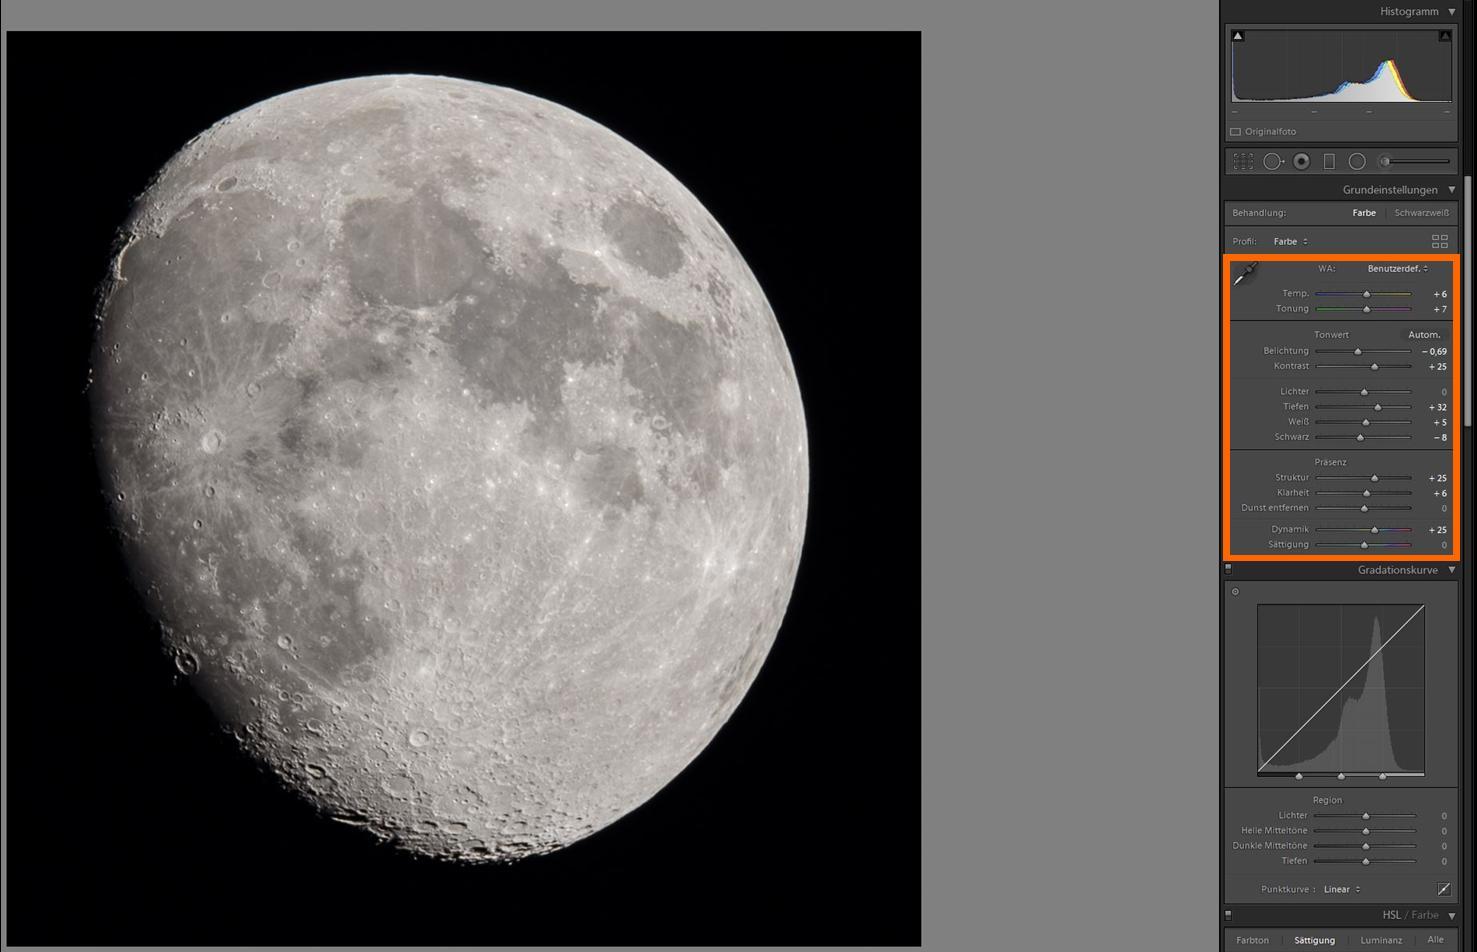 Lightroom-Bearbeitung des Mondfotografie-Summenbildes